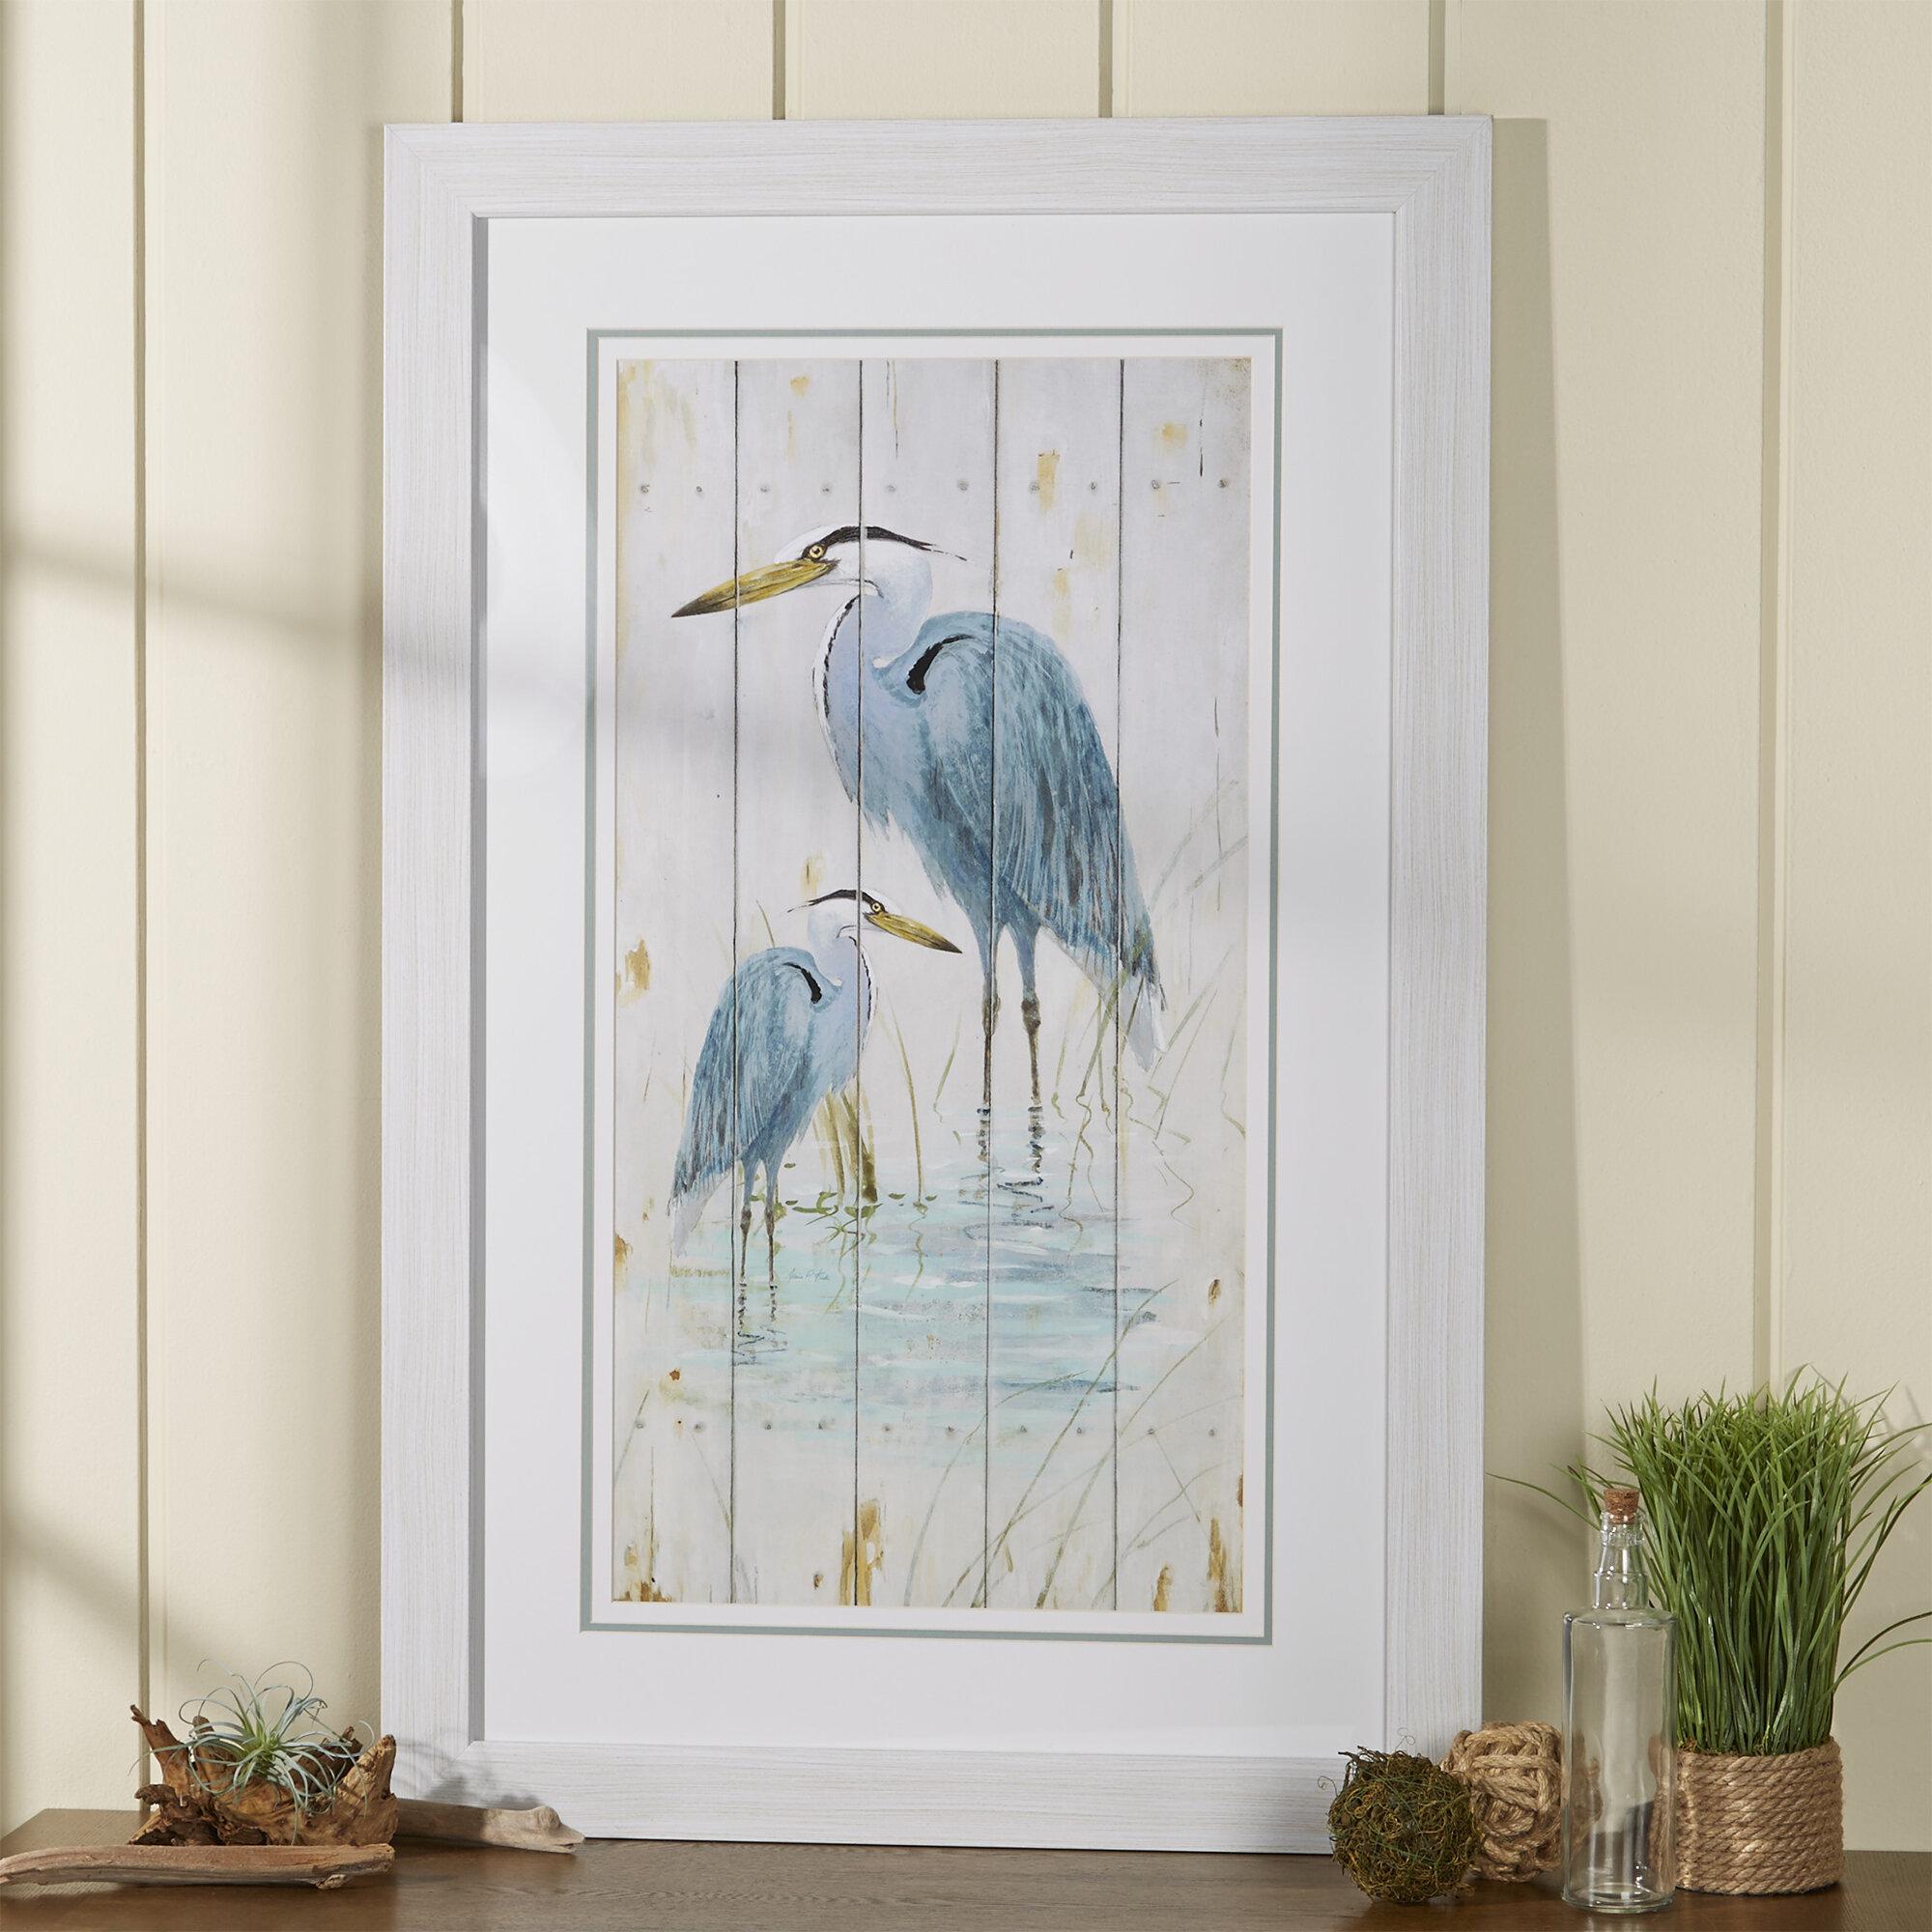 beachcrest home  u0027blue heron duo u0027 graphic art  u0026 reviews   wayfair  rh   wayfair